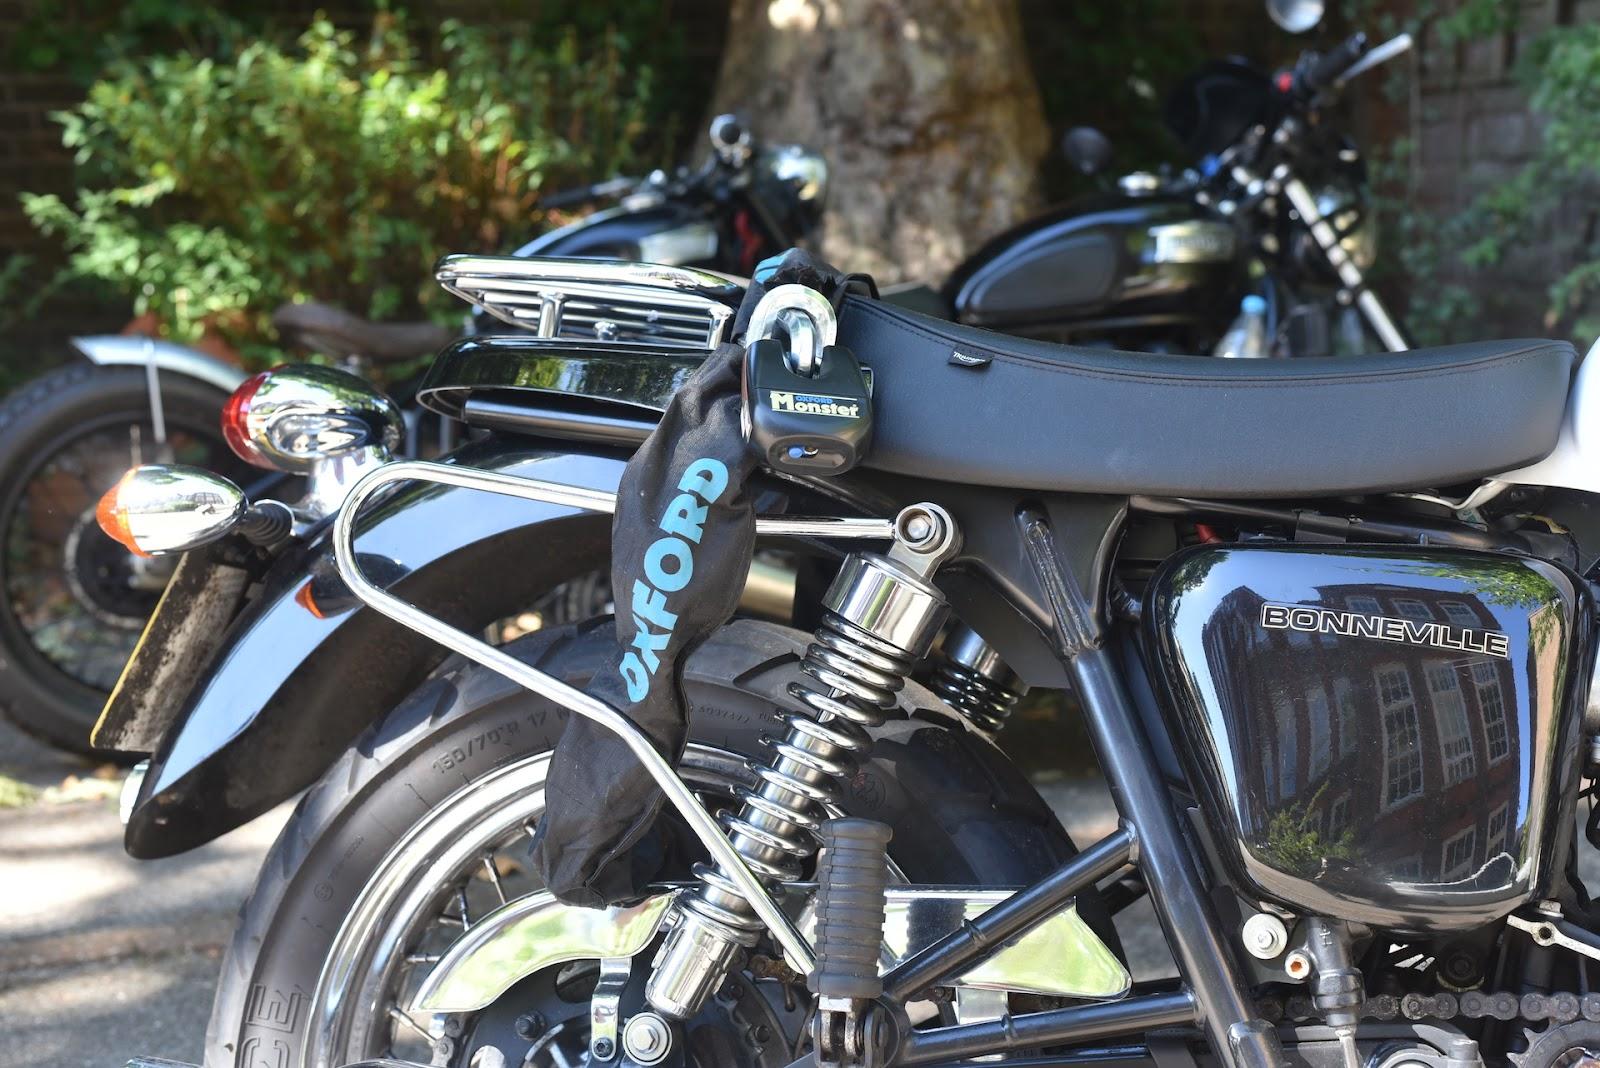 https://www.sportsbikeshop.co.uk/motorcycle_parts/content_prod/55982/#/23639,0,0